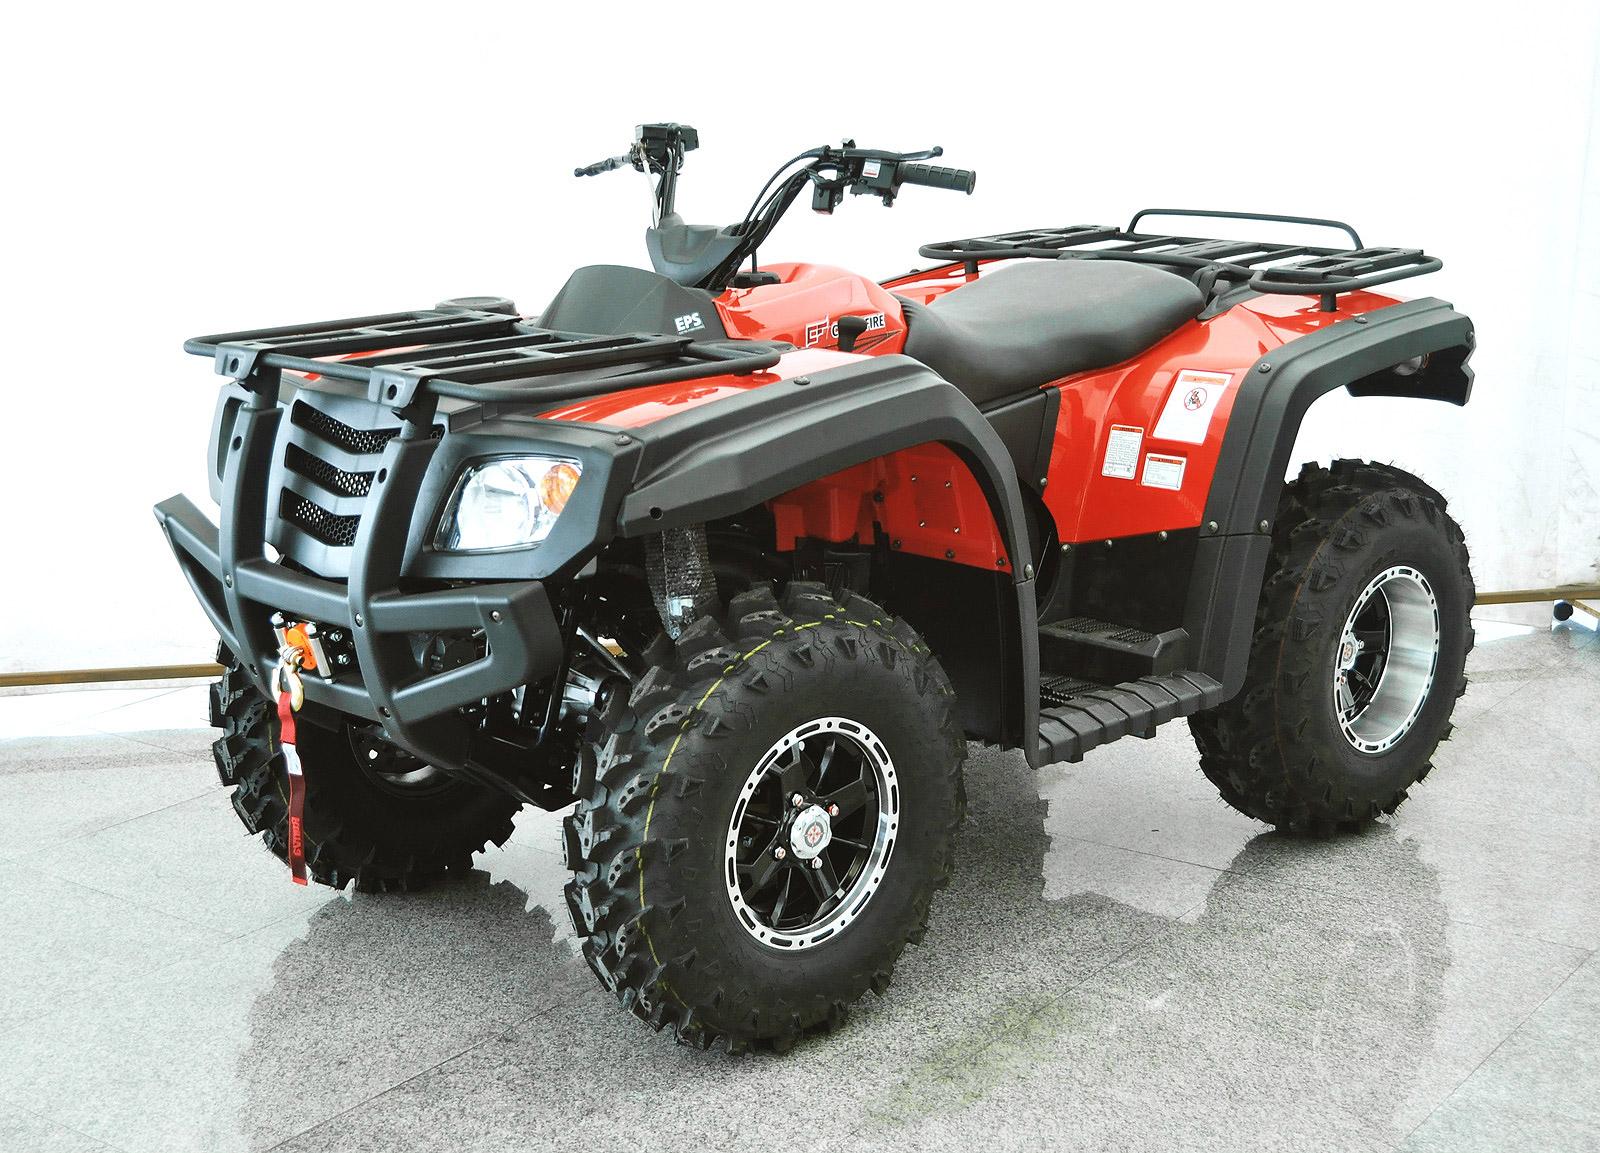 crossfire-territory-500-atv-quad-bike-front